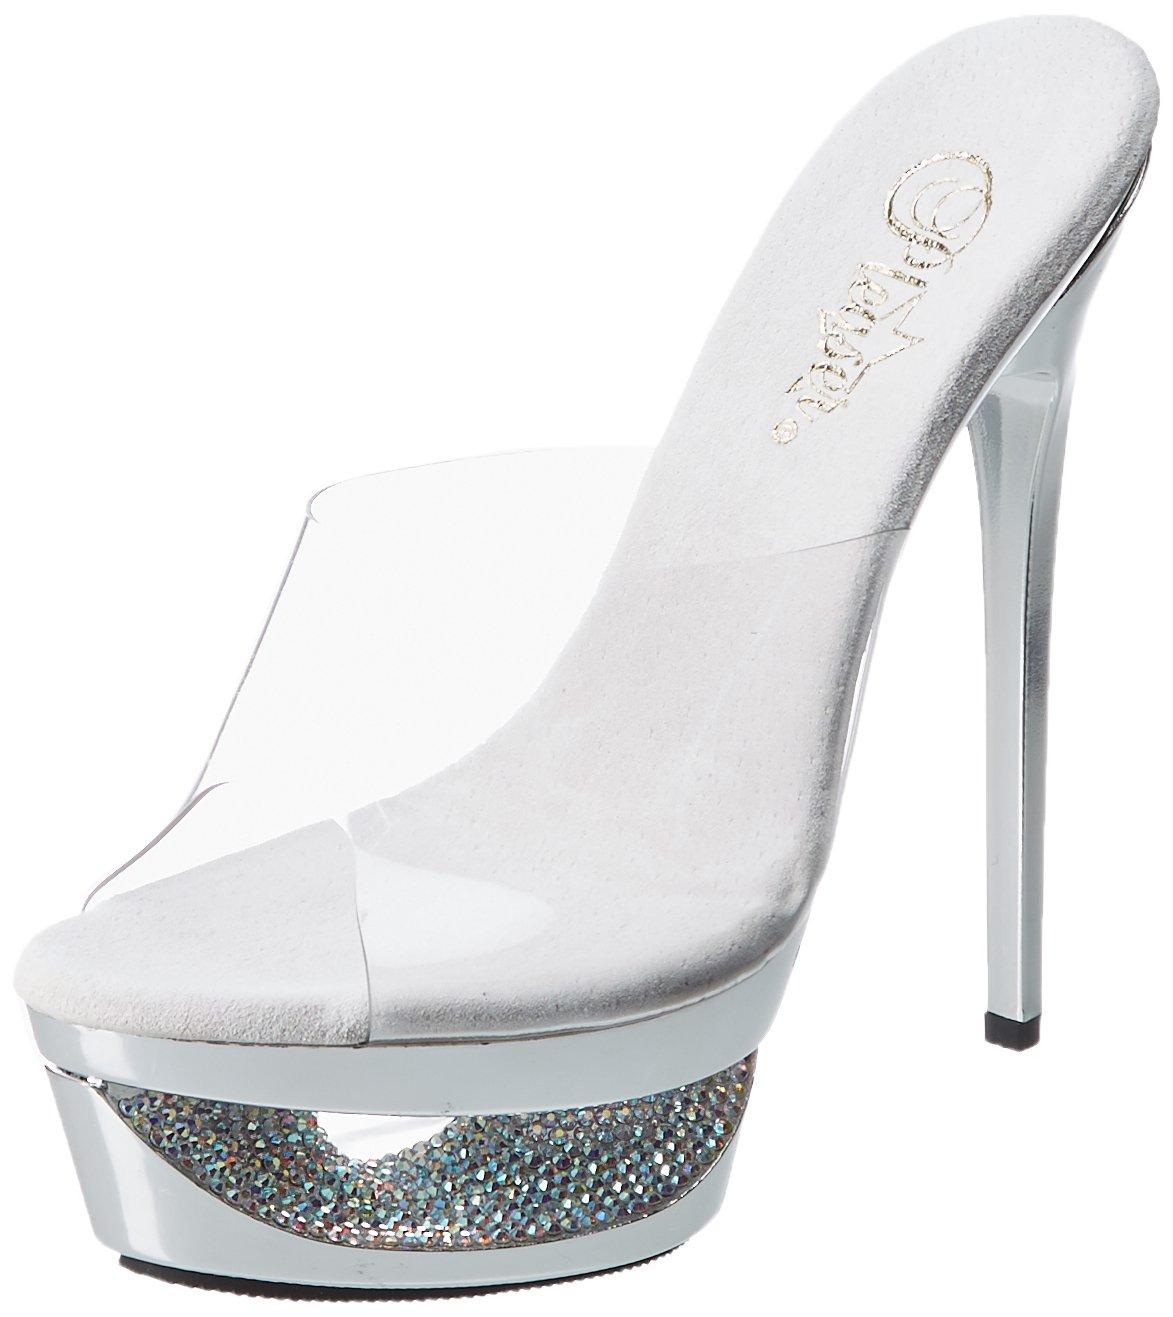 Pleaser Women's Eclipse 601DM Slide Fashion Sandals B00B472MHW 6 B(M) US|Clear / Silver Chrome